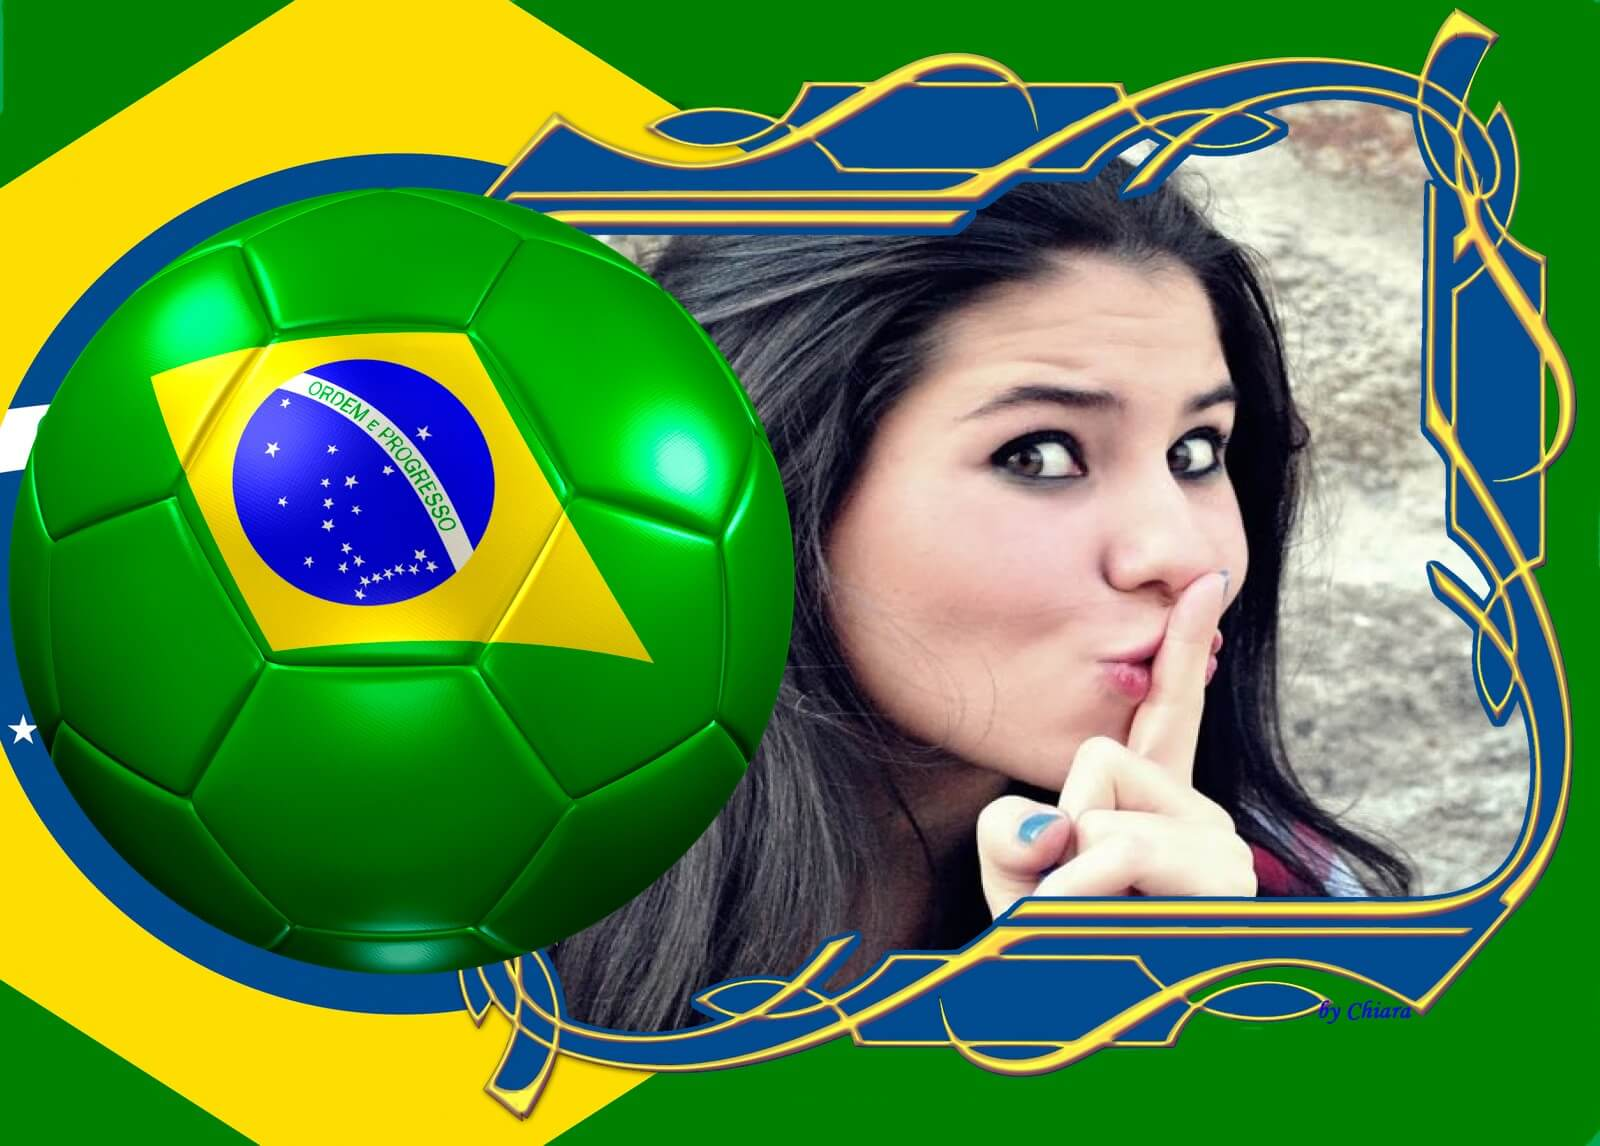 moldura-mundial-brasil